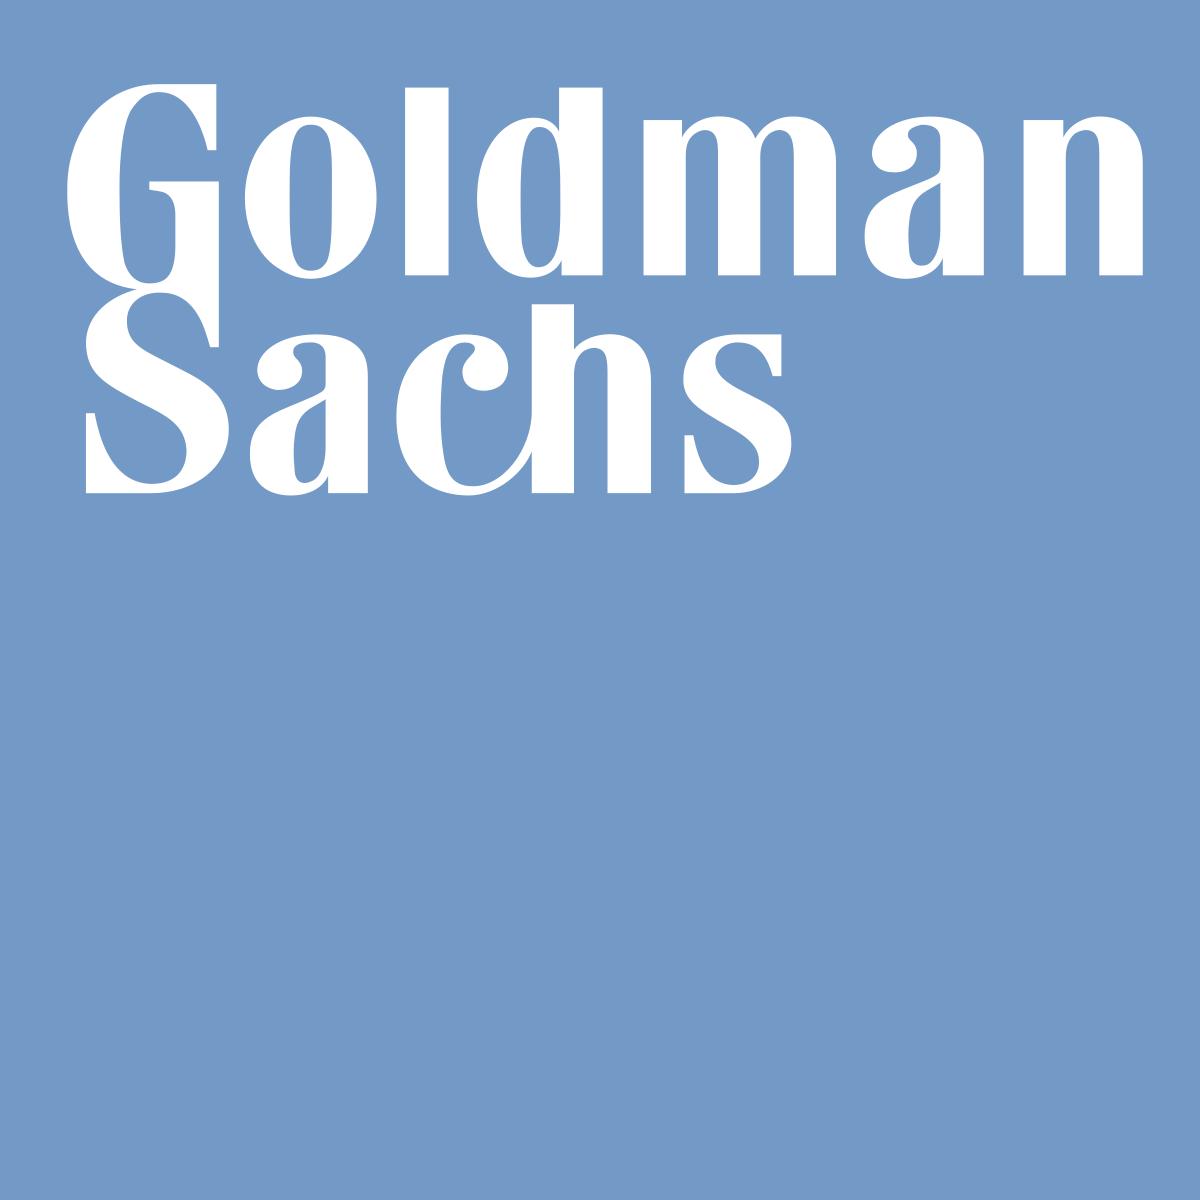 Medium  www.goldmansachs.com